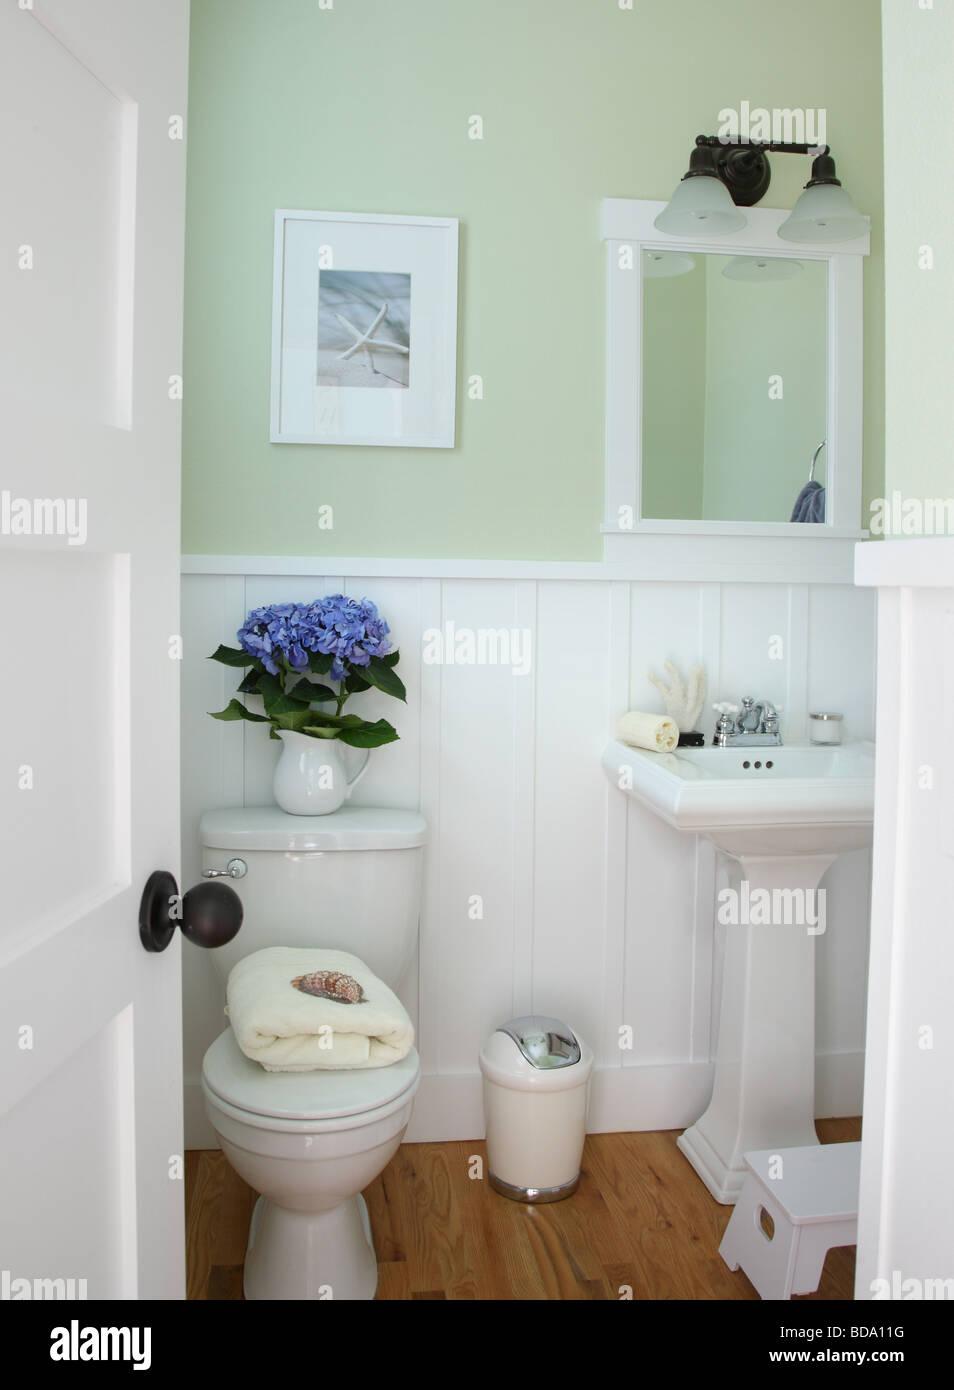 Baño interior Imagen De Stock